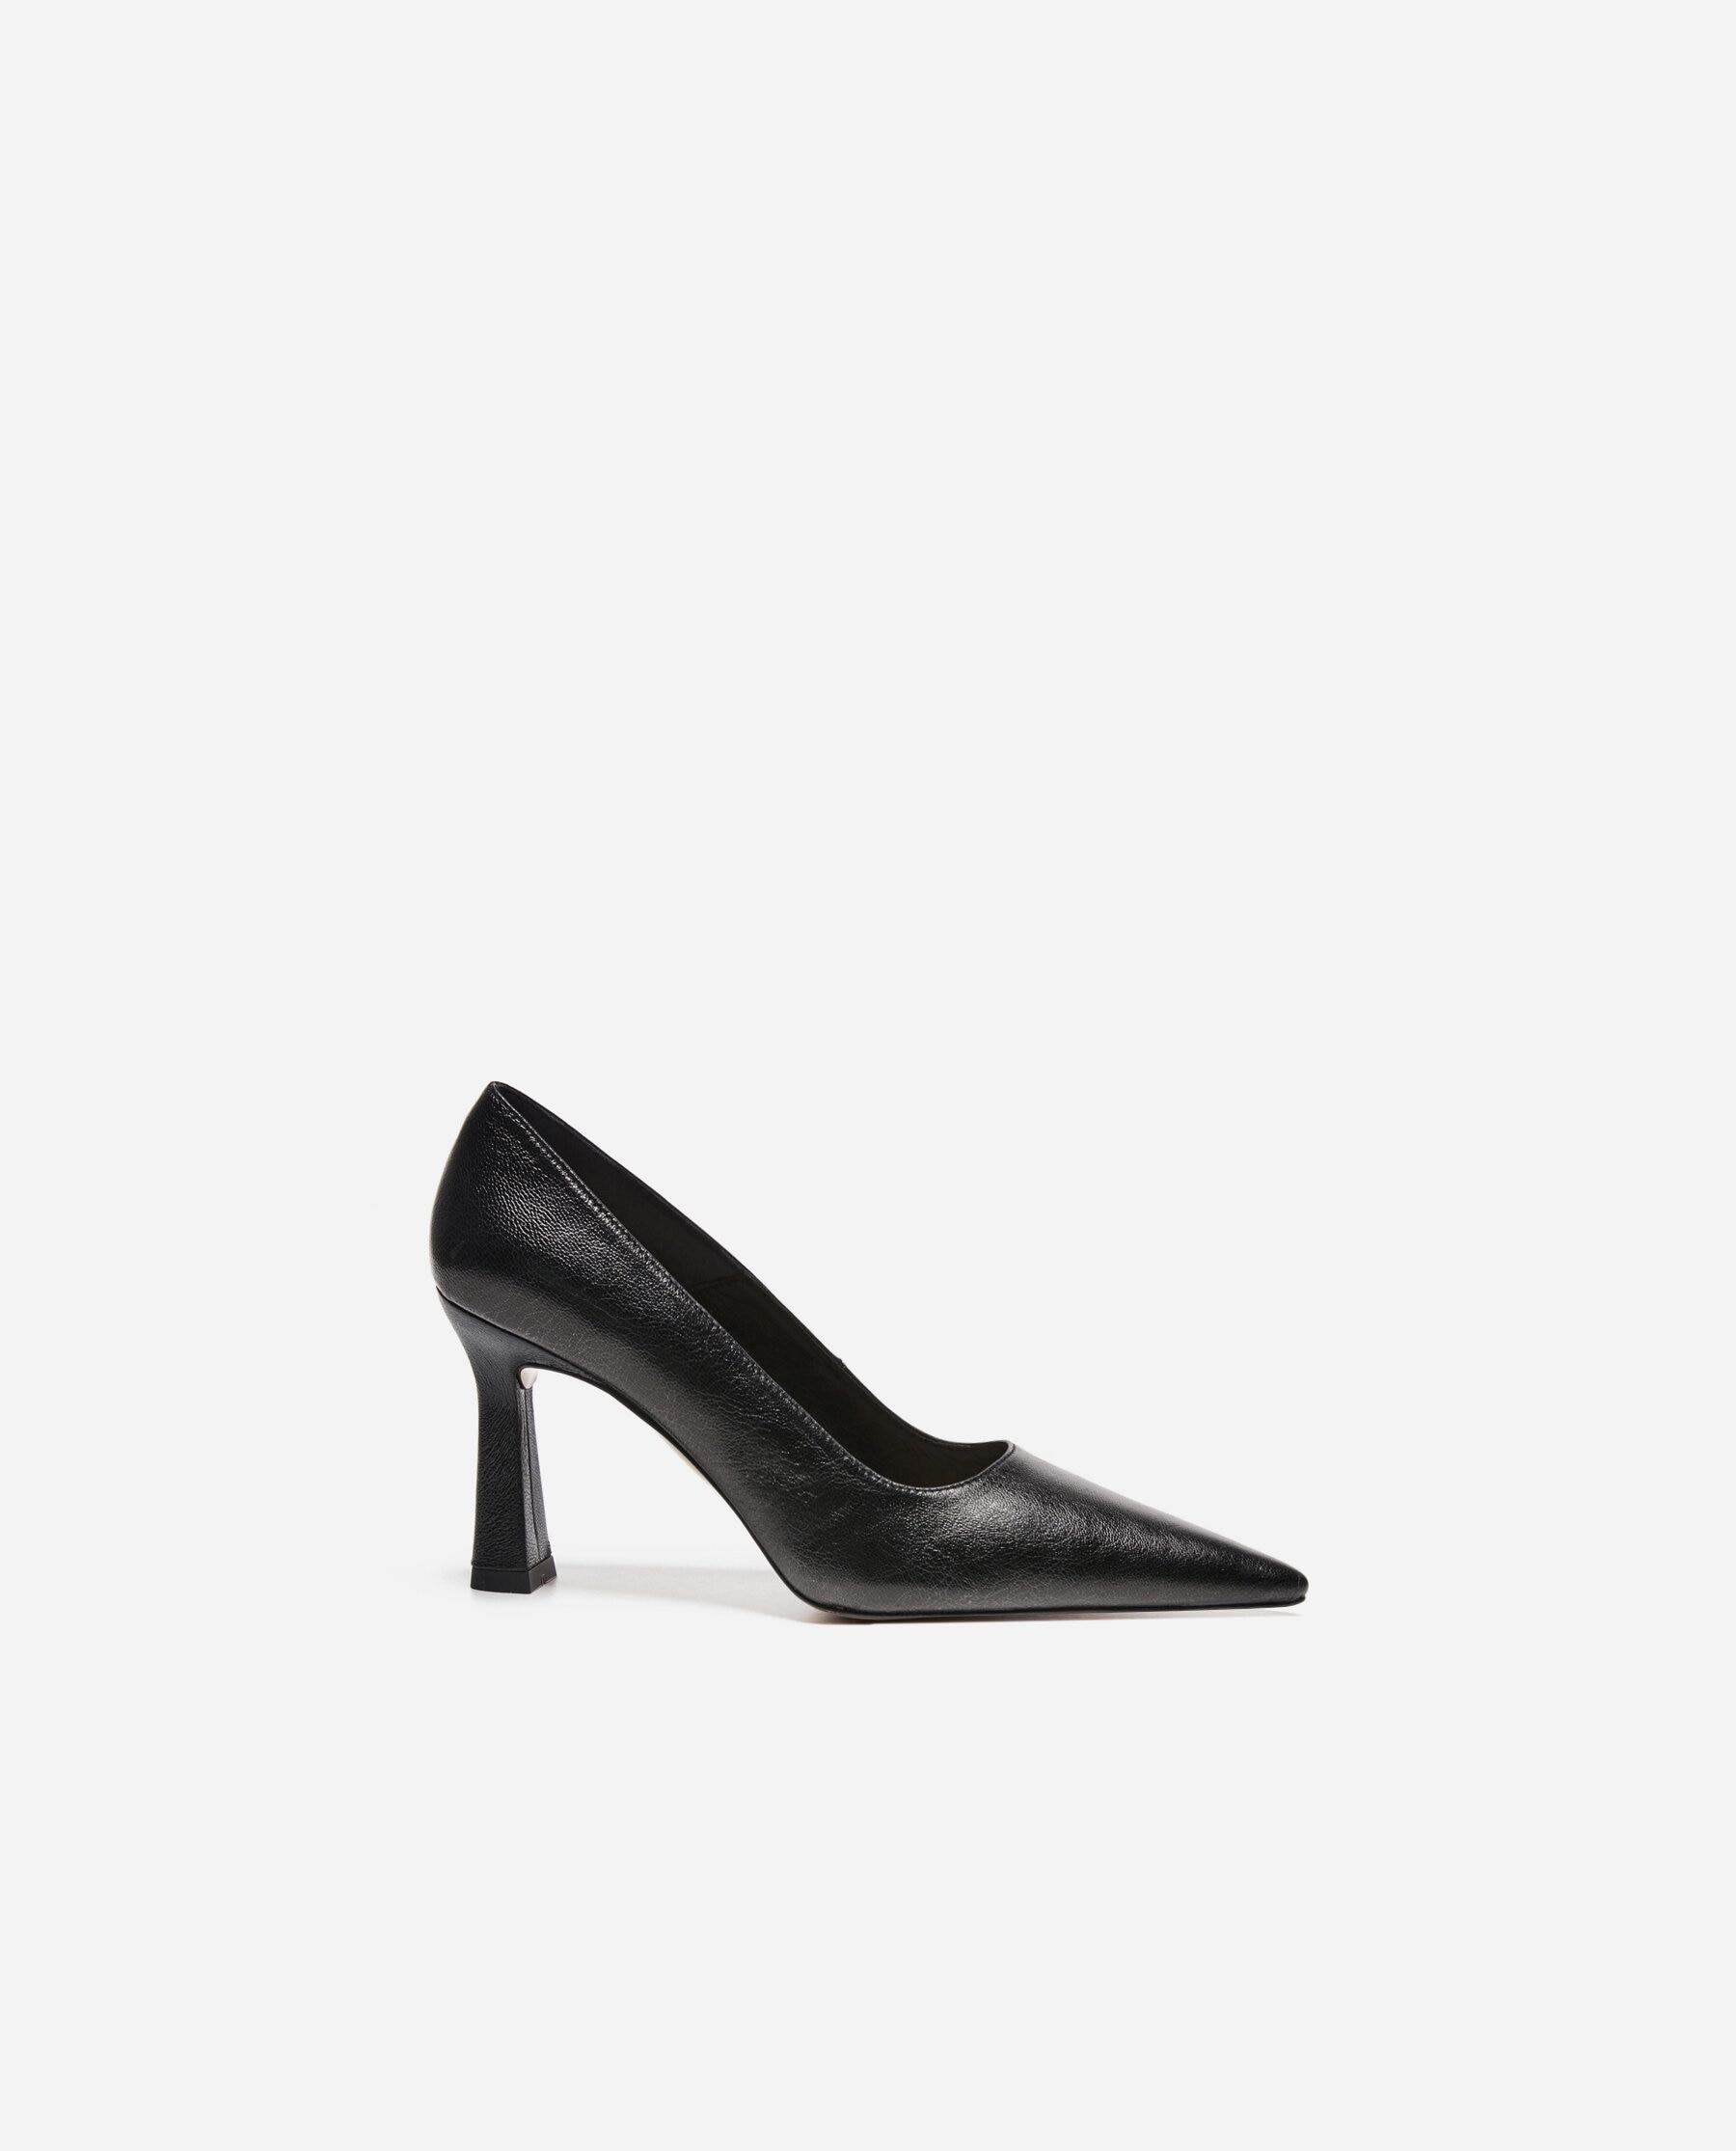 Renee Leather Shiny Black